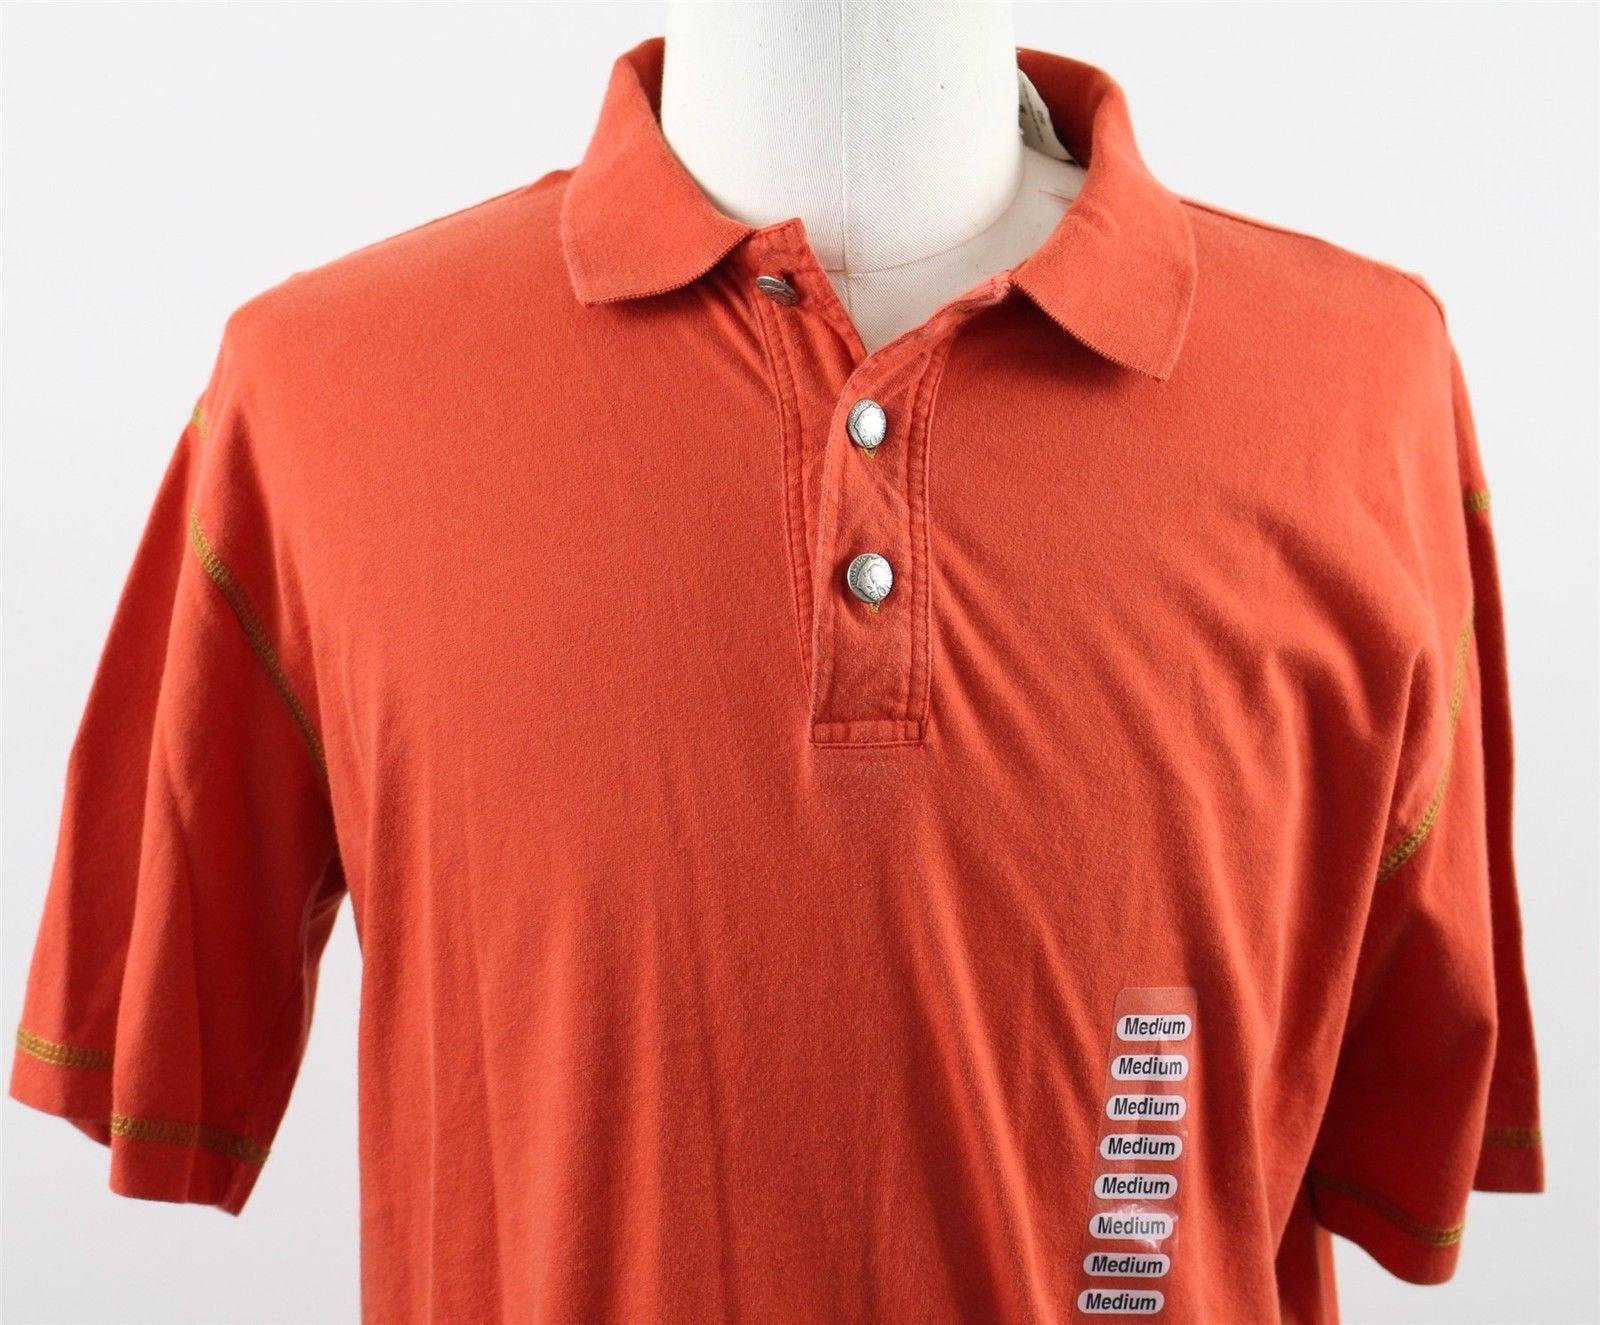 064445faa38 Nwt Orvis Montana Am S/S Polo Shirt Mens and 11 similar items